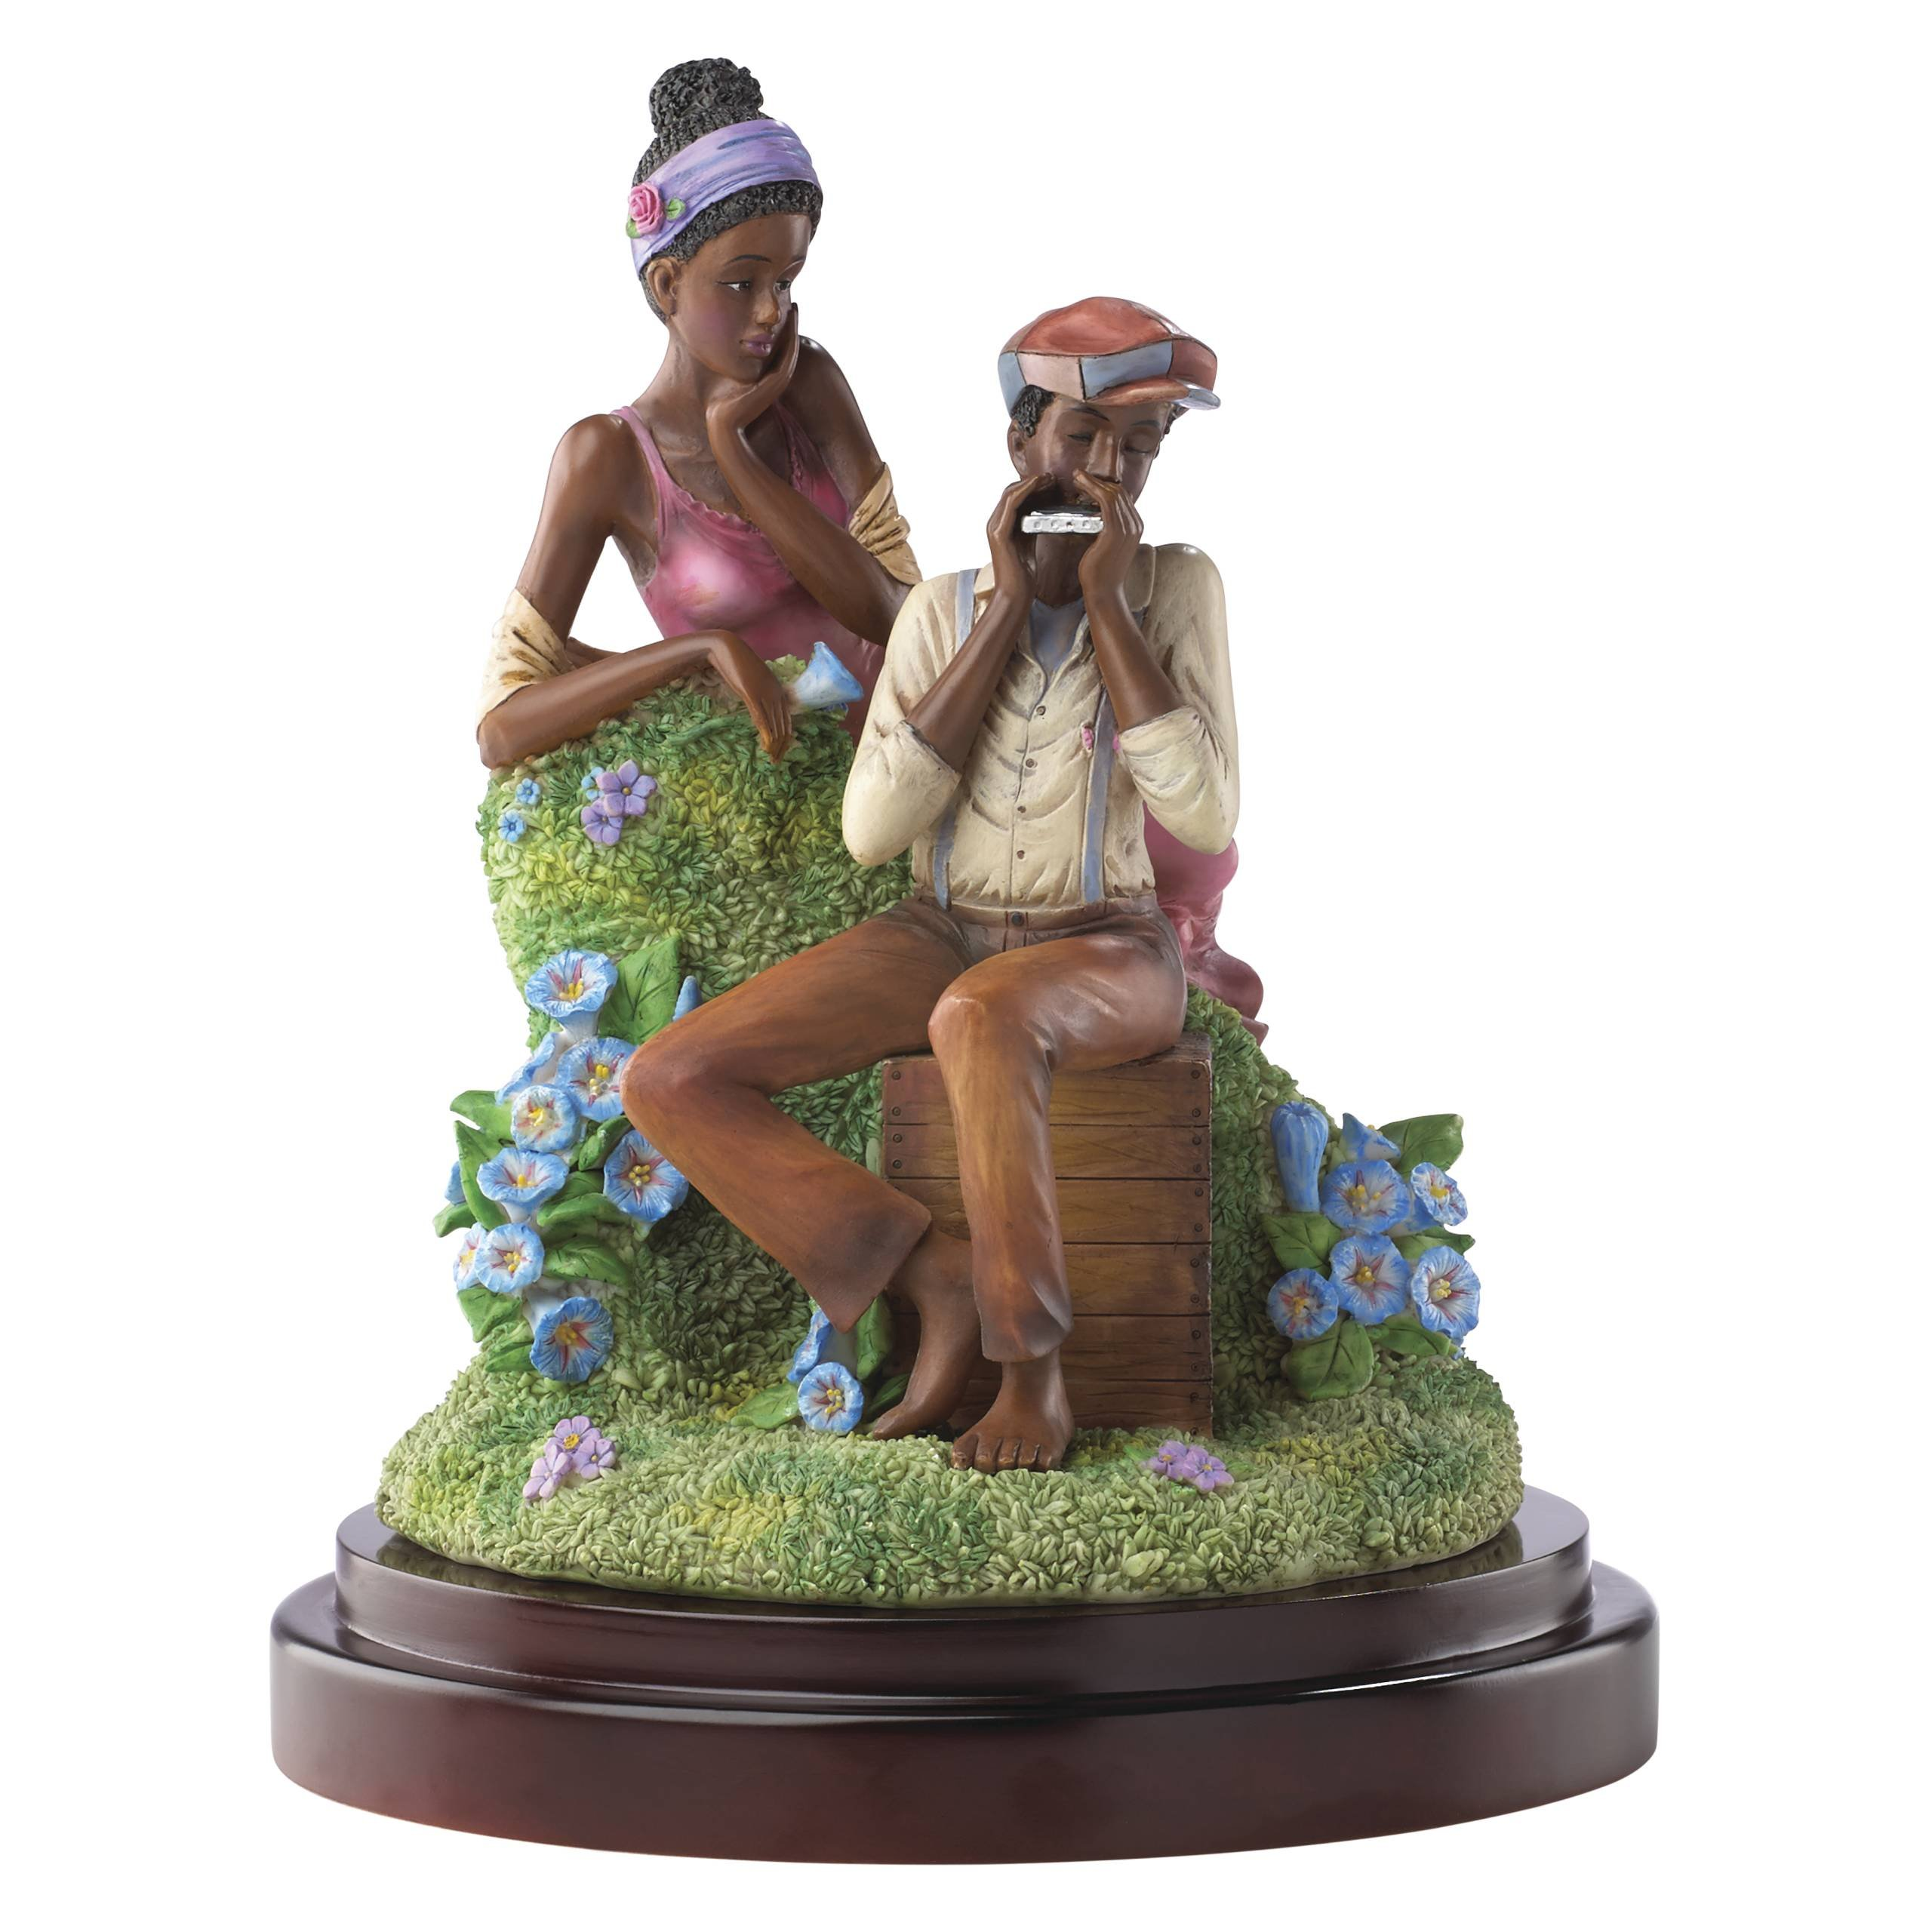 Lenox 855284 John Holyfield's Ebony Visions Love Jones Limited Edition Figurine